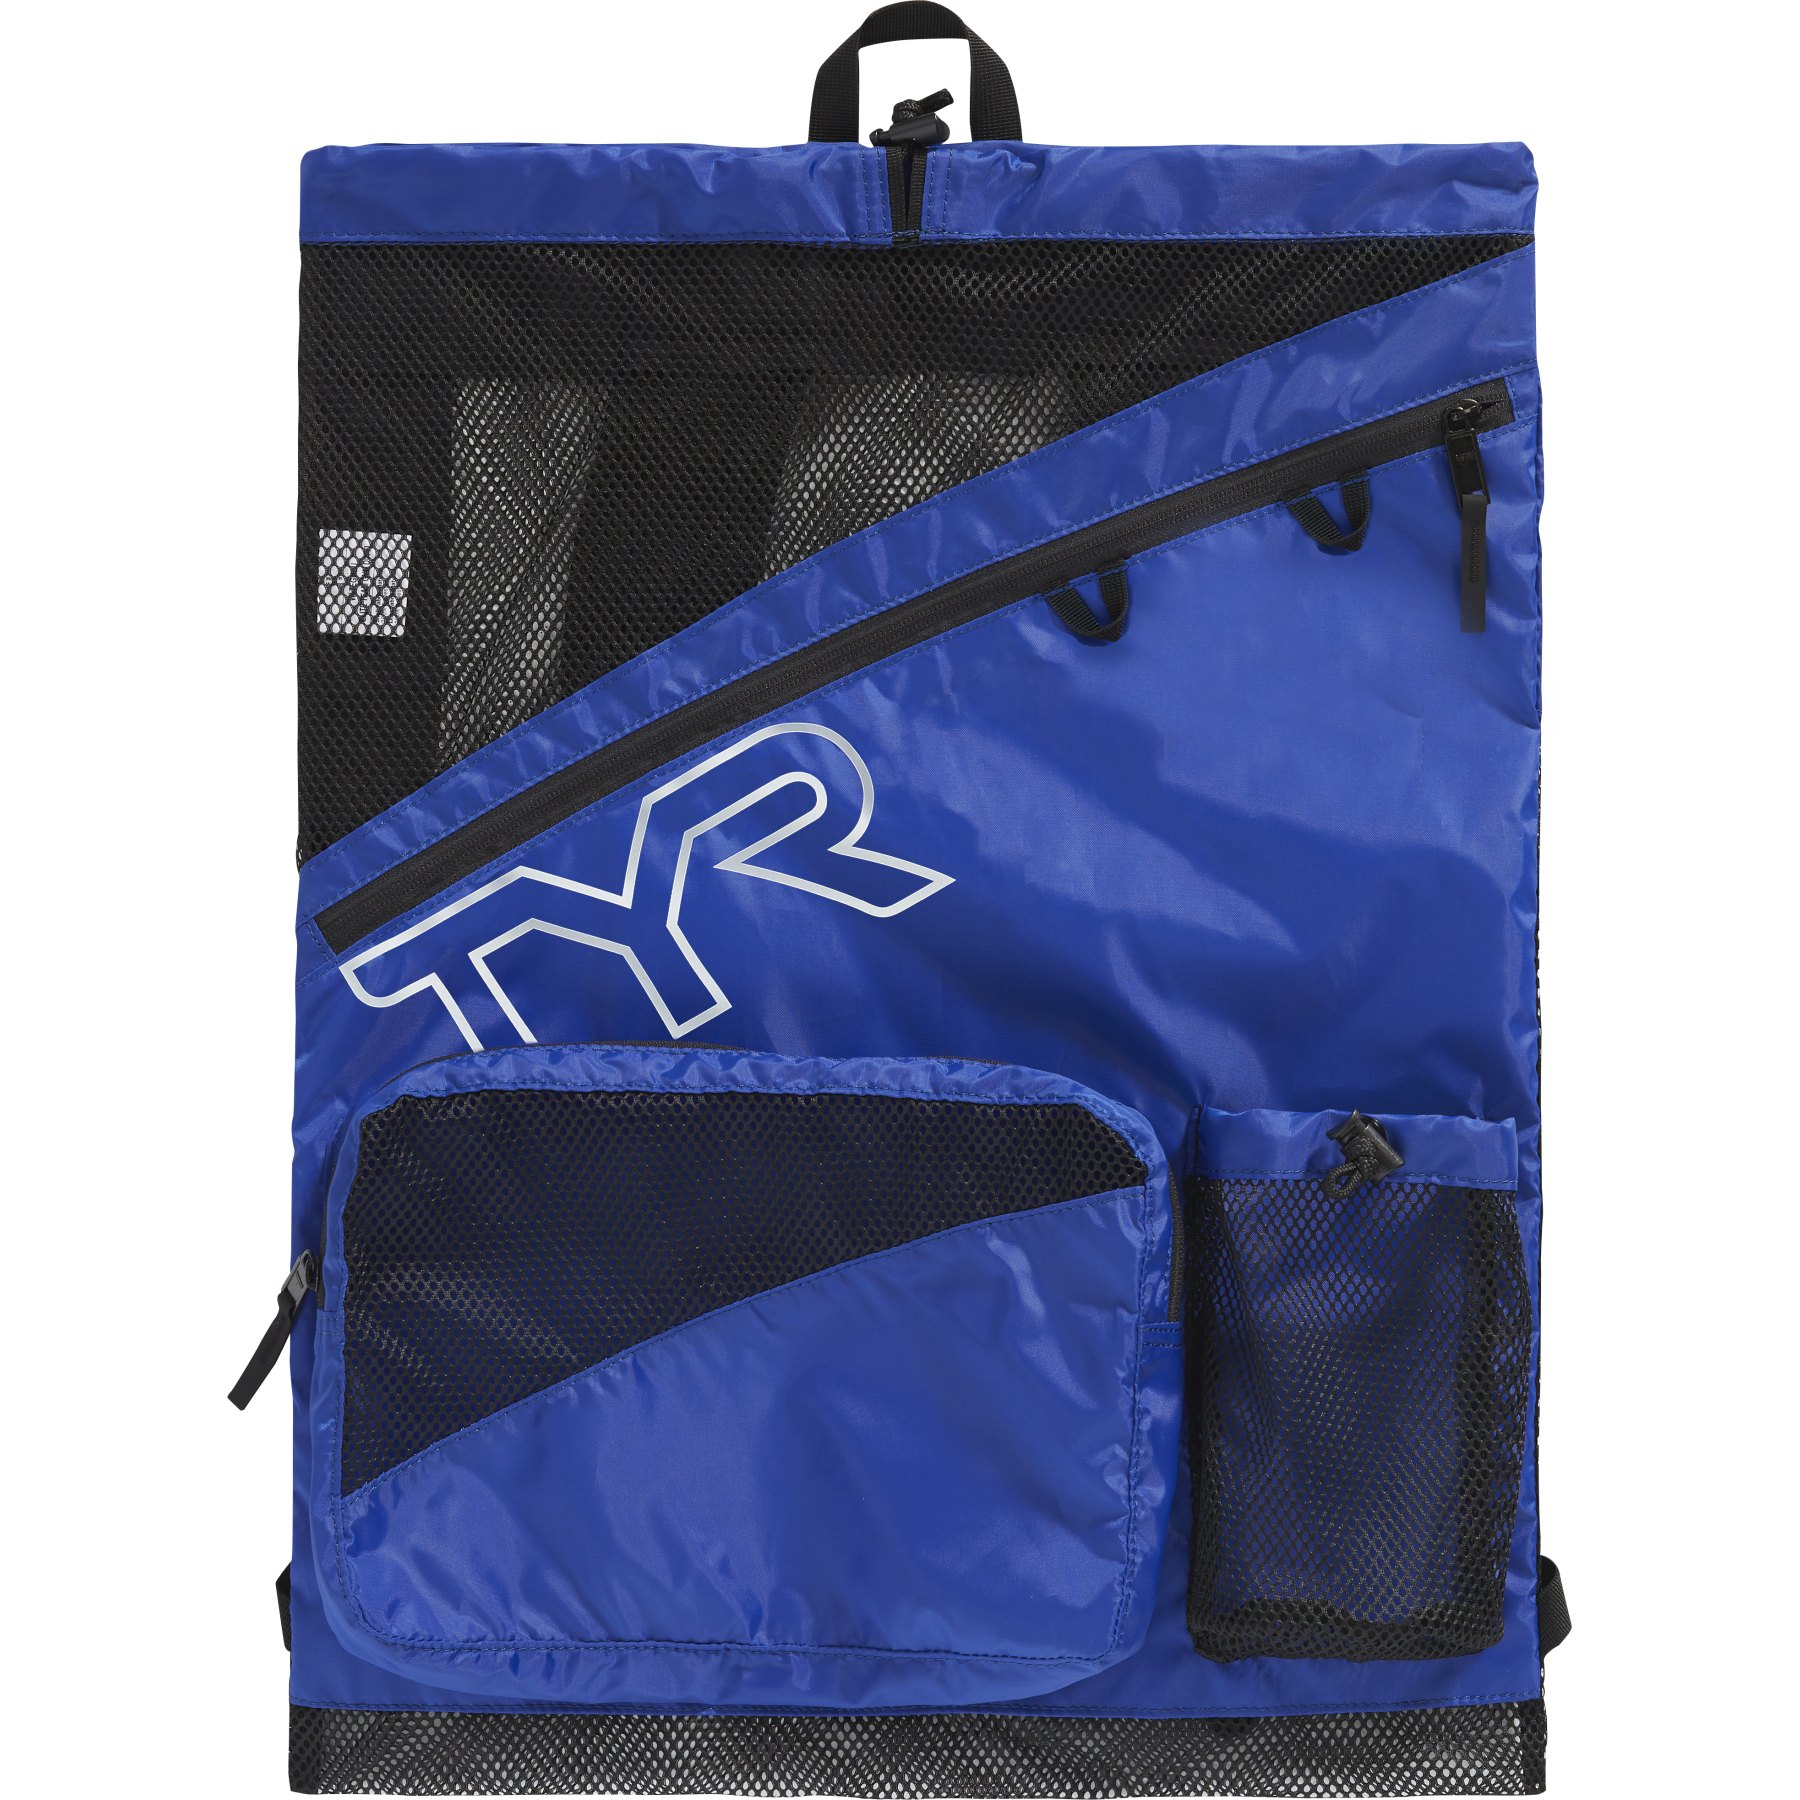 TYR Team Elite Mesh Backpack - royal